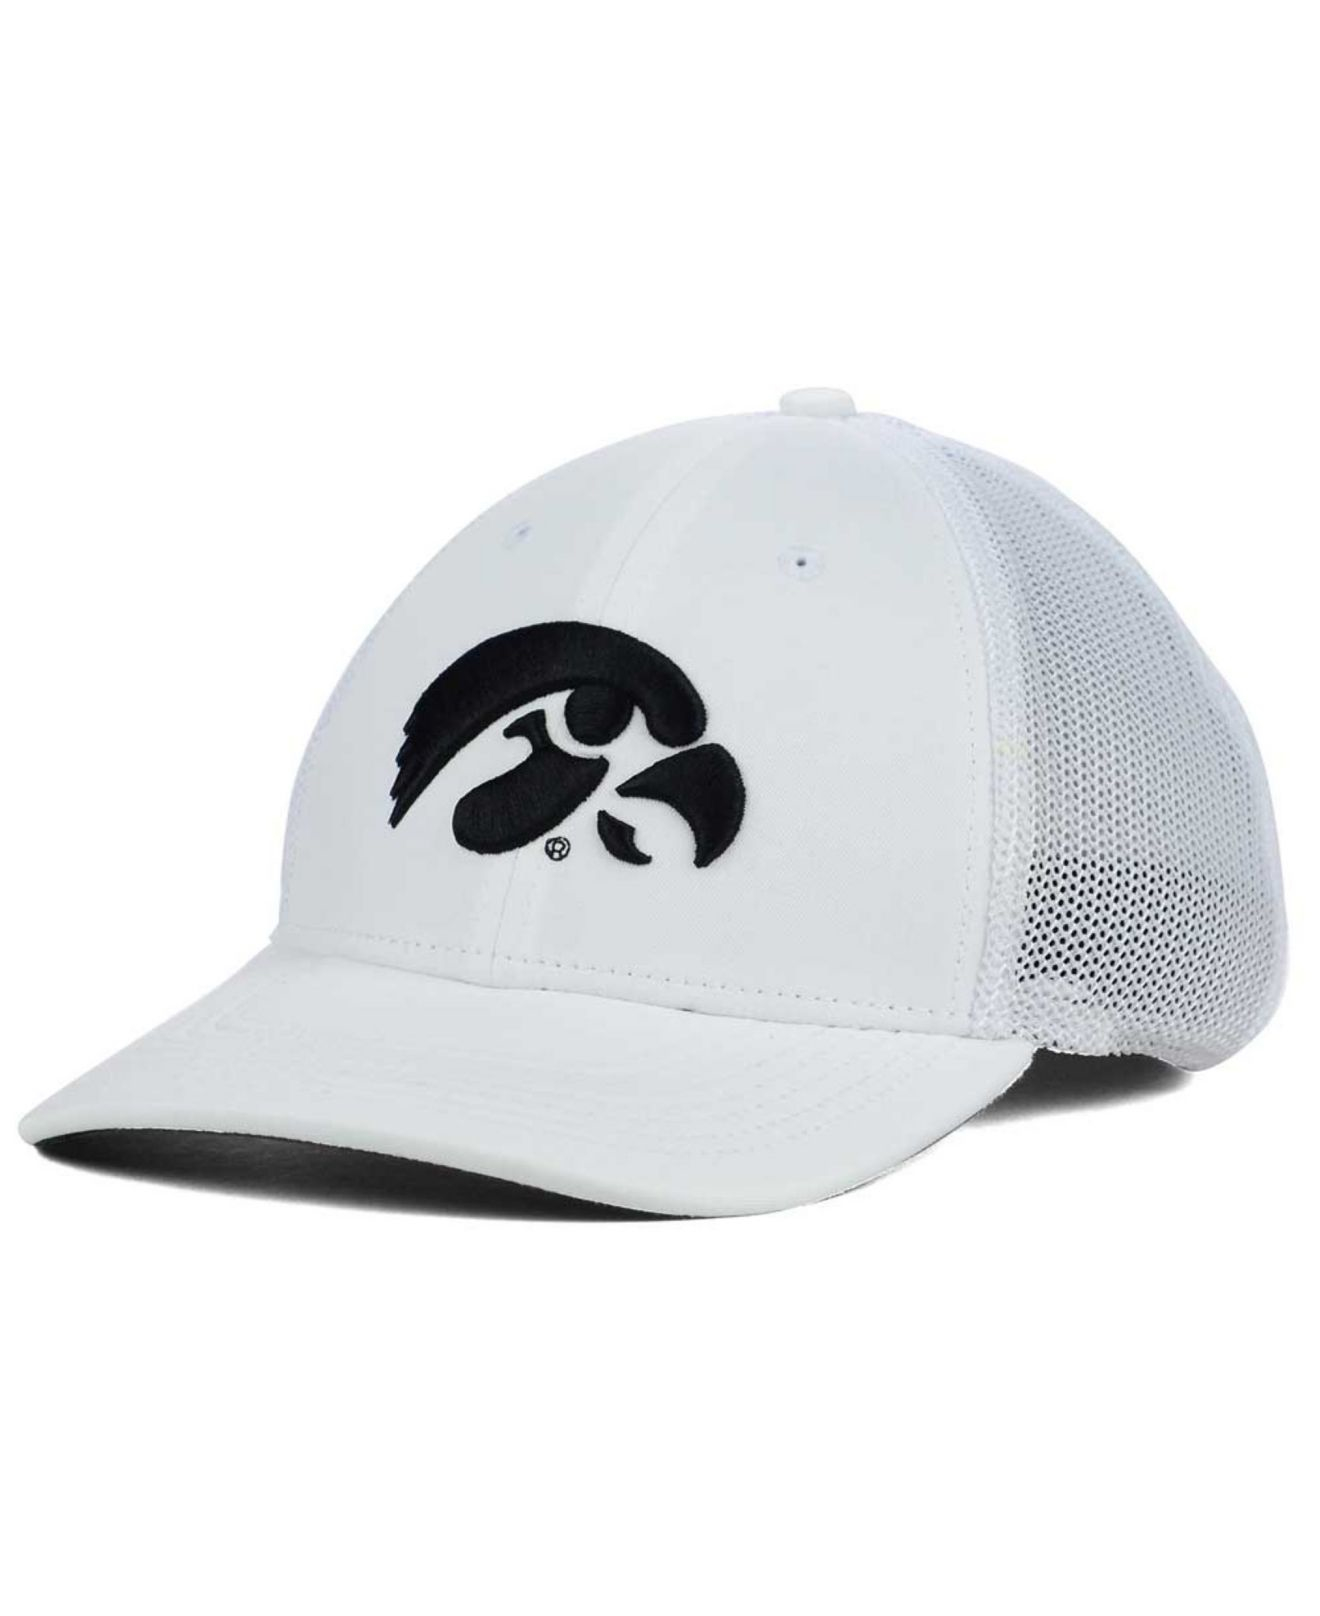 d8d5d058b74 ... promo code for lyst nike iowa hawkeyes l91 mesh swoosh flex cap in  white for men